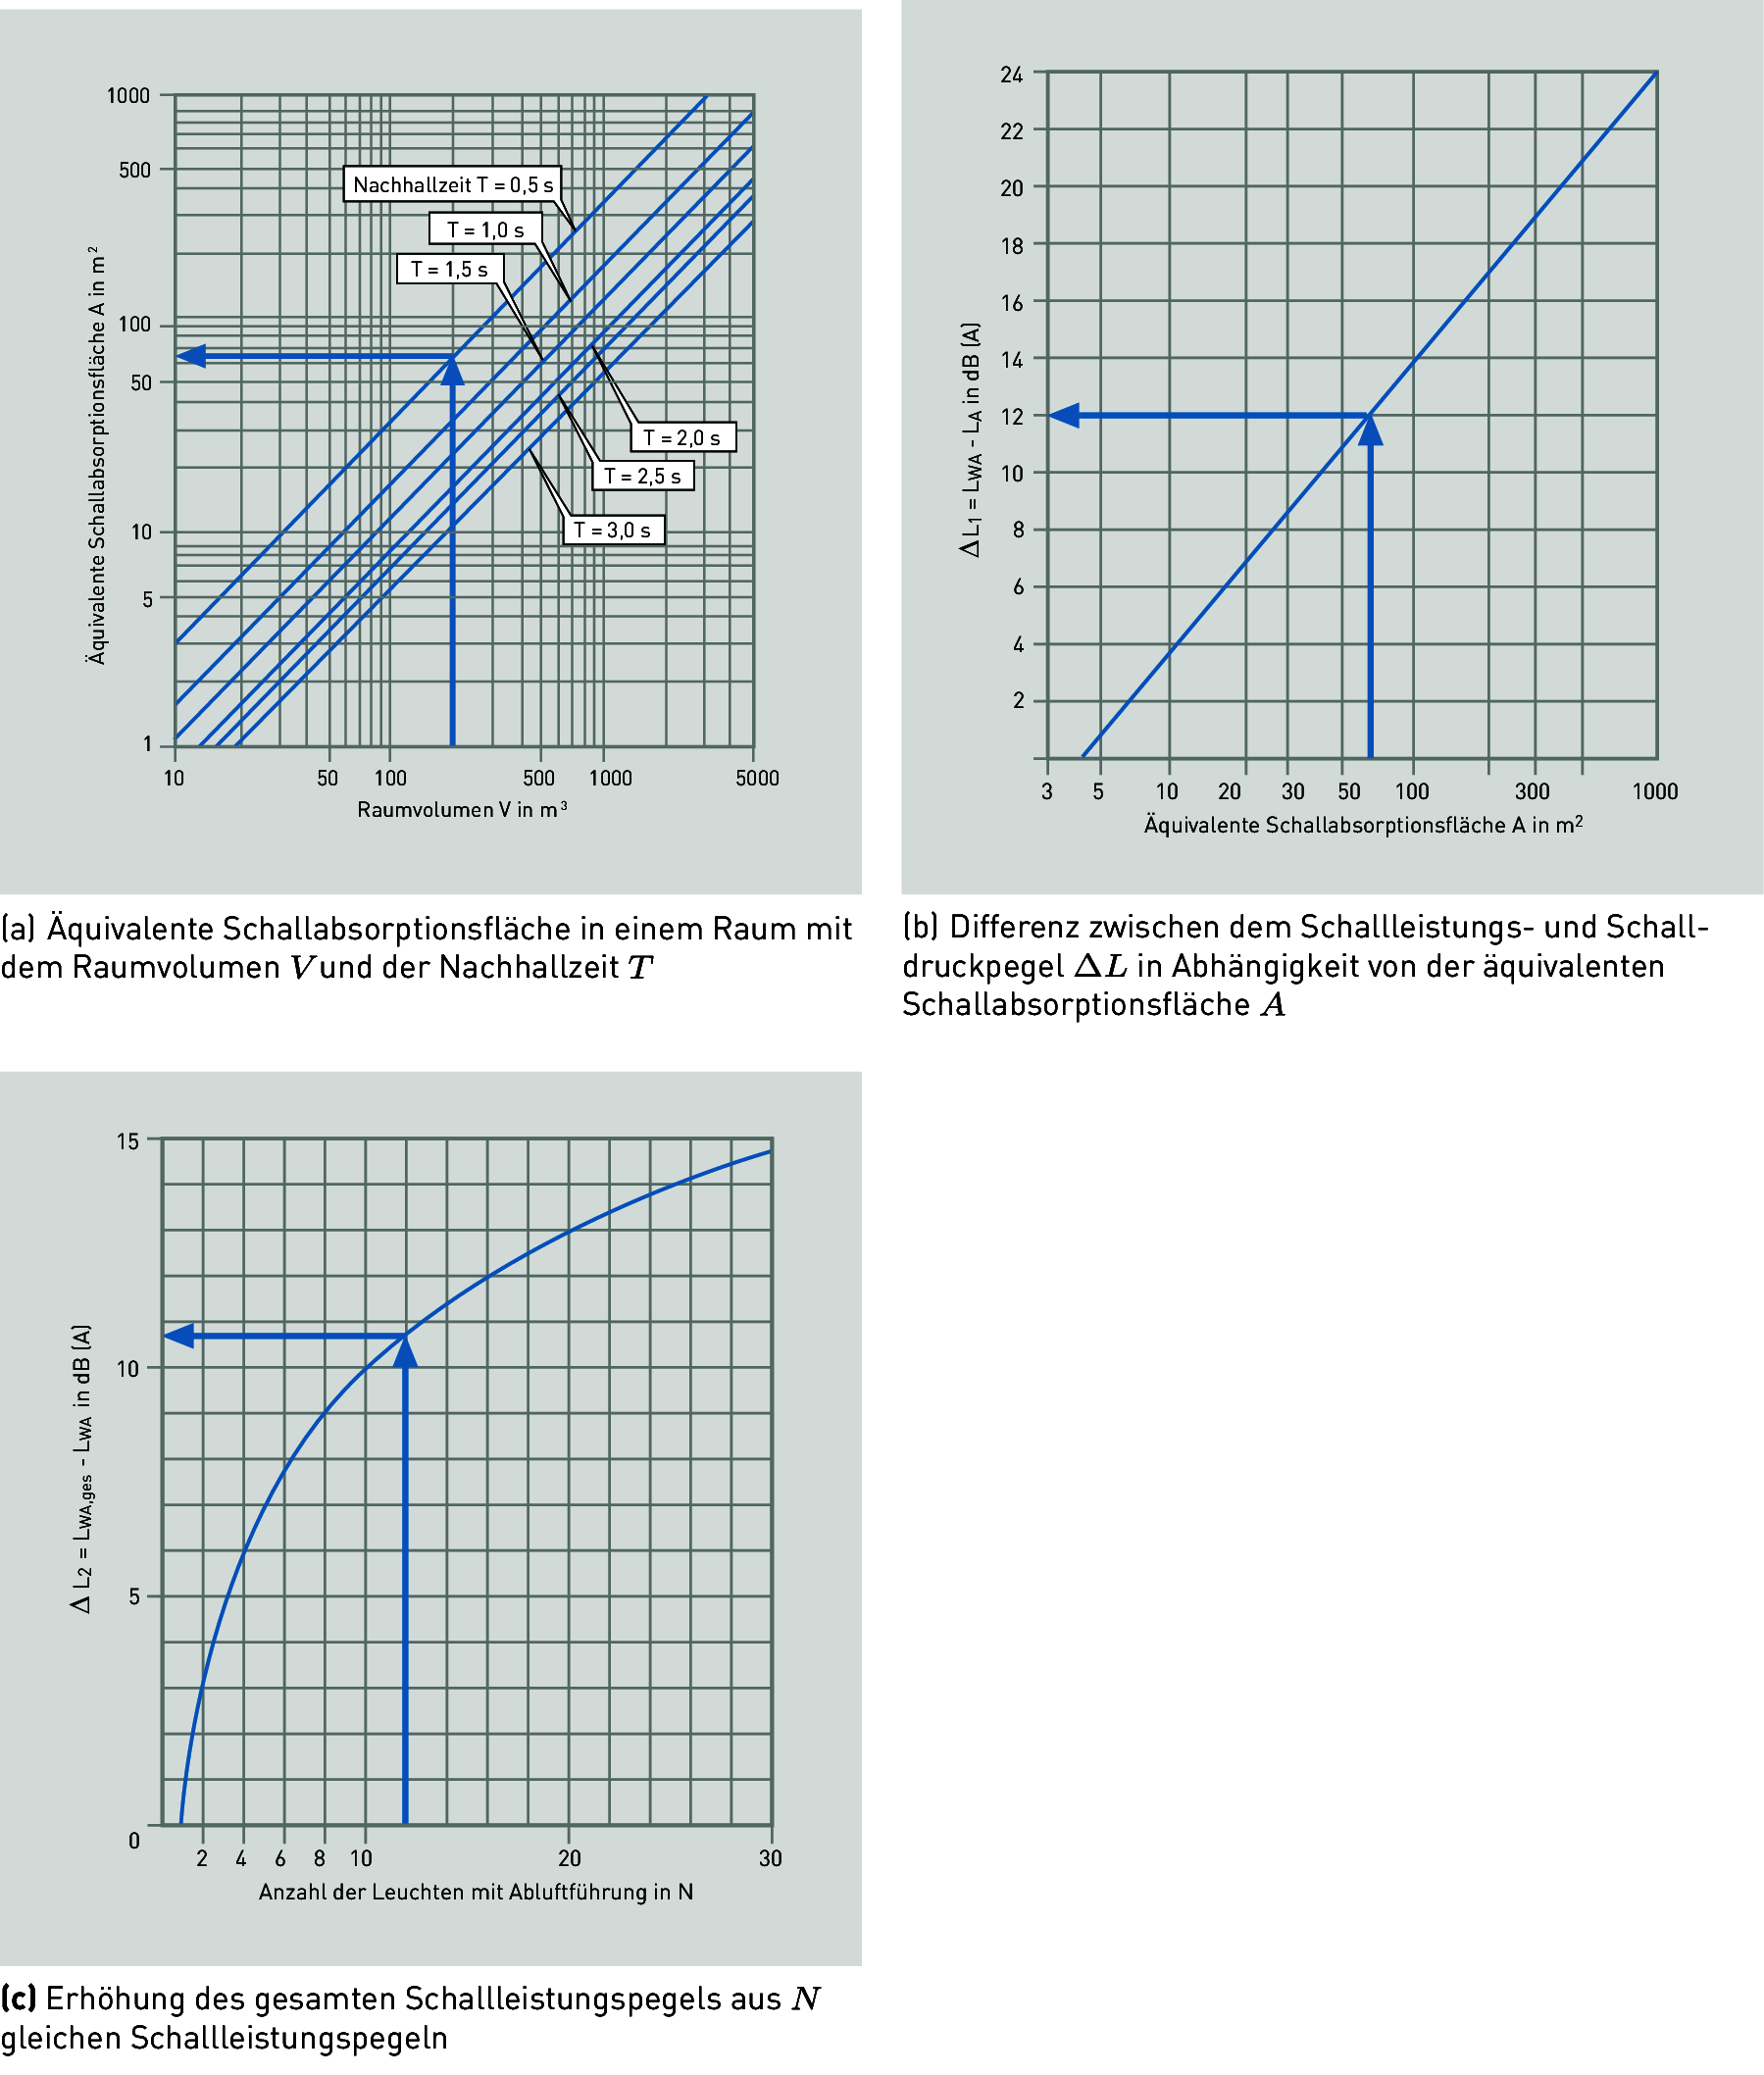 Äquivalente Schallabsorptionsfläche